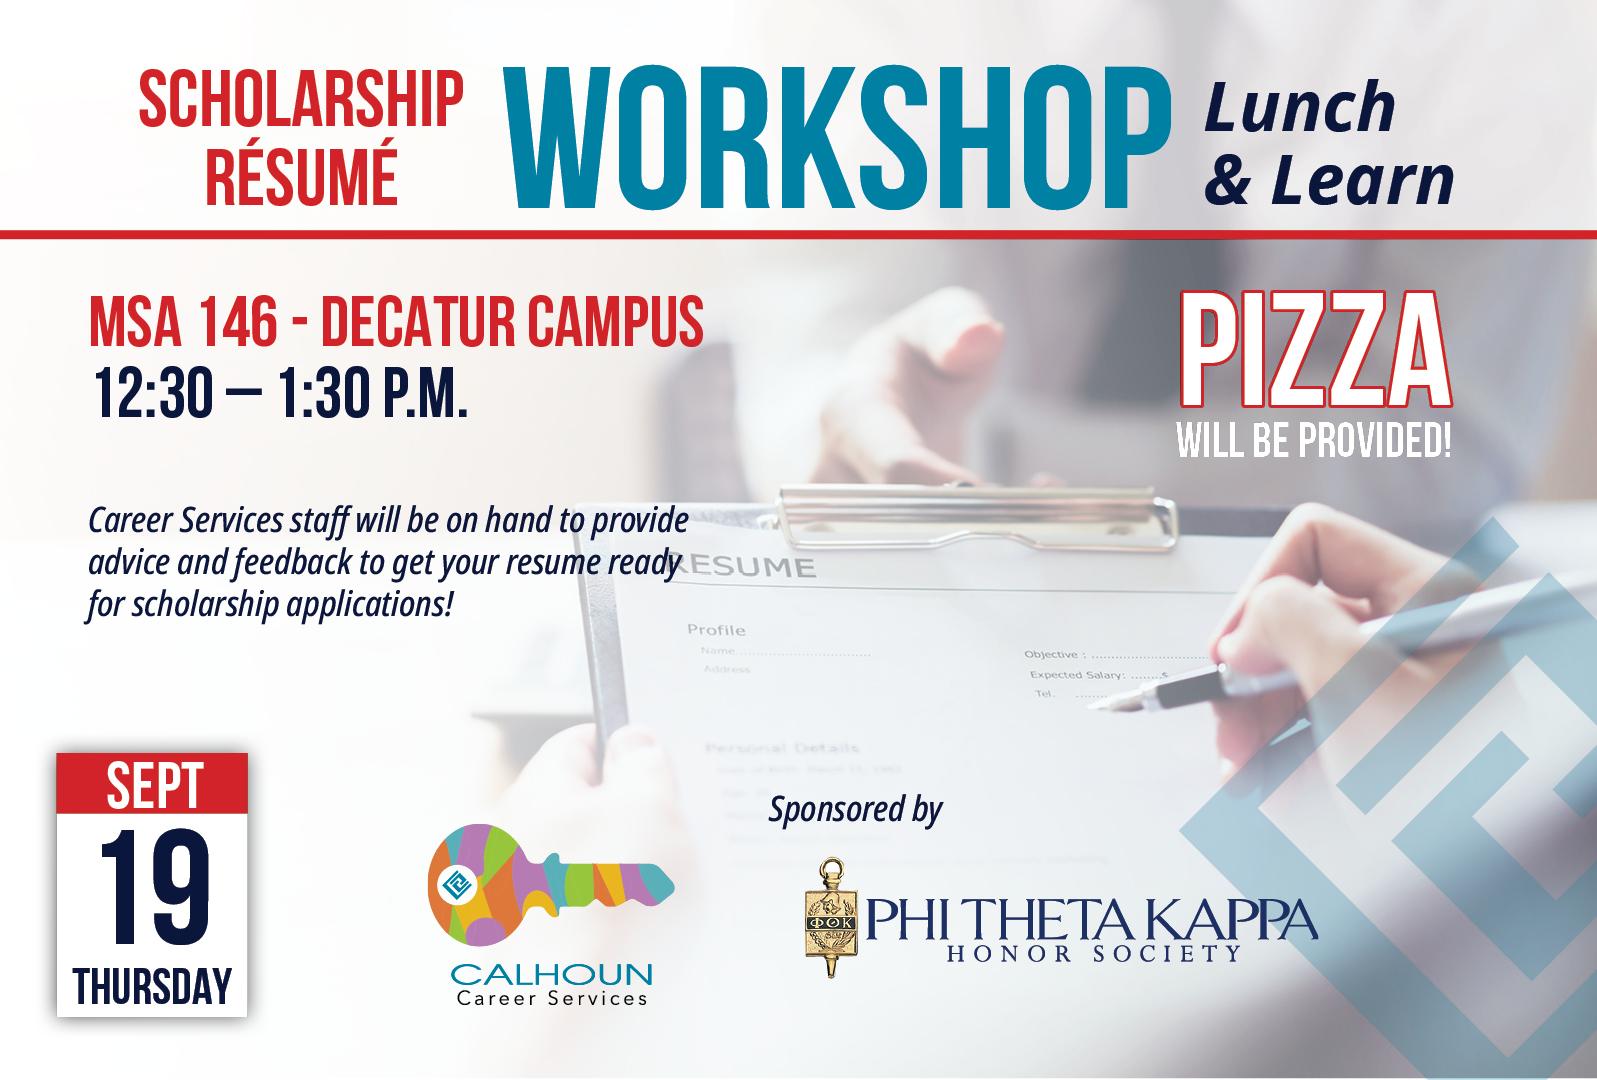 Scholarship Resume Workshop